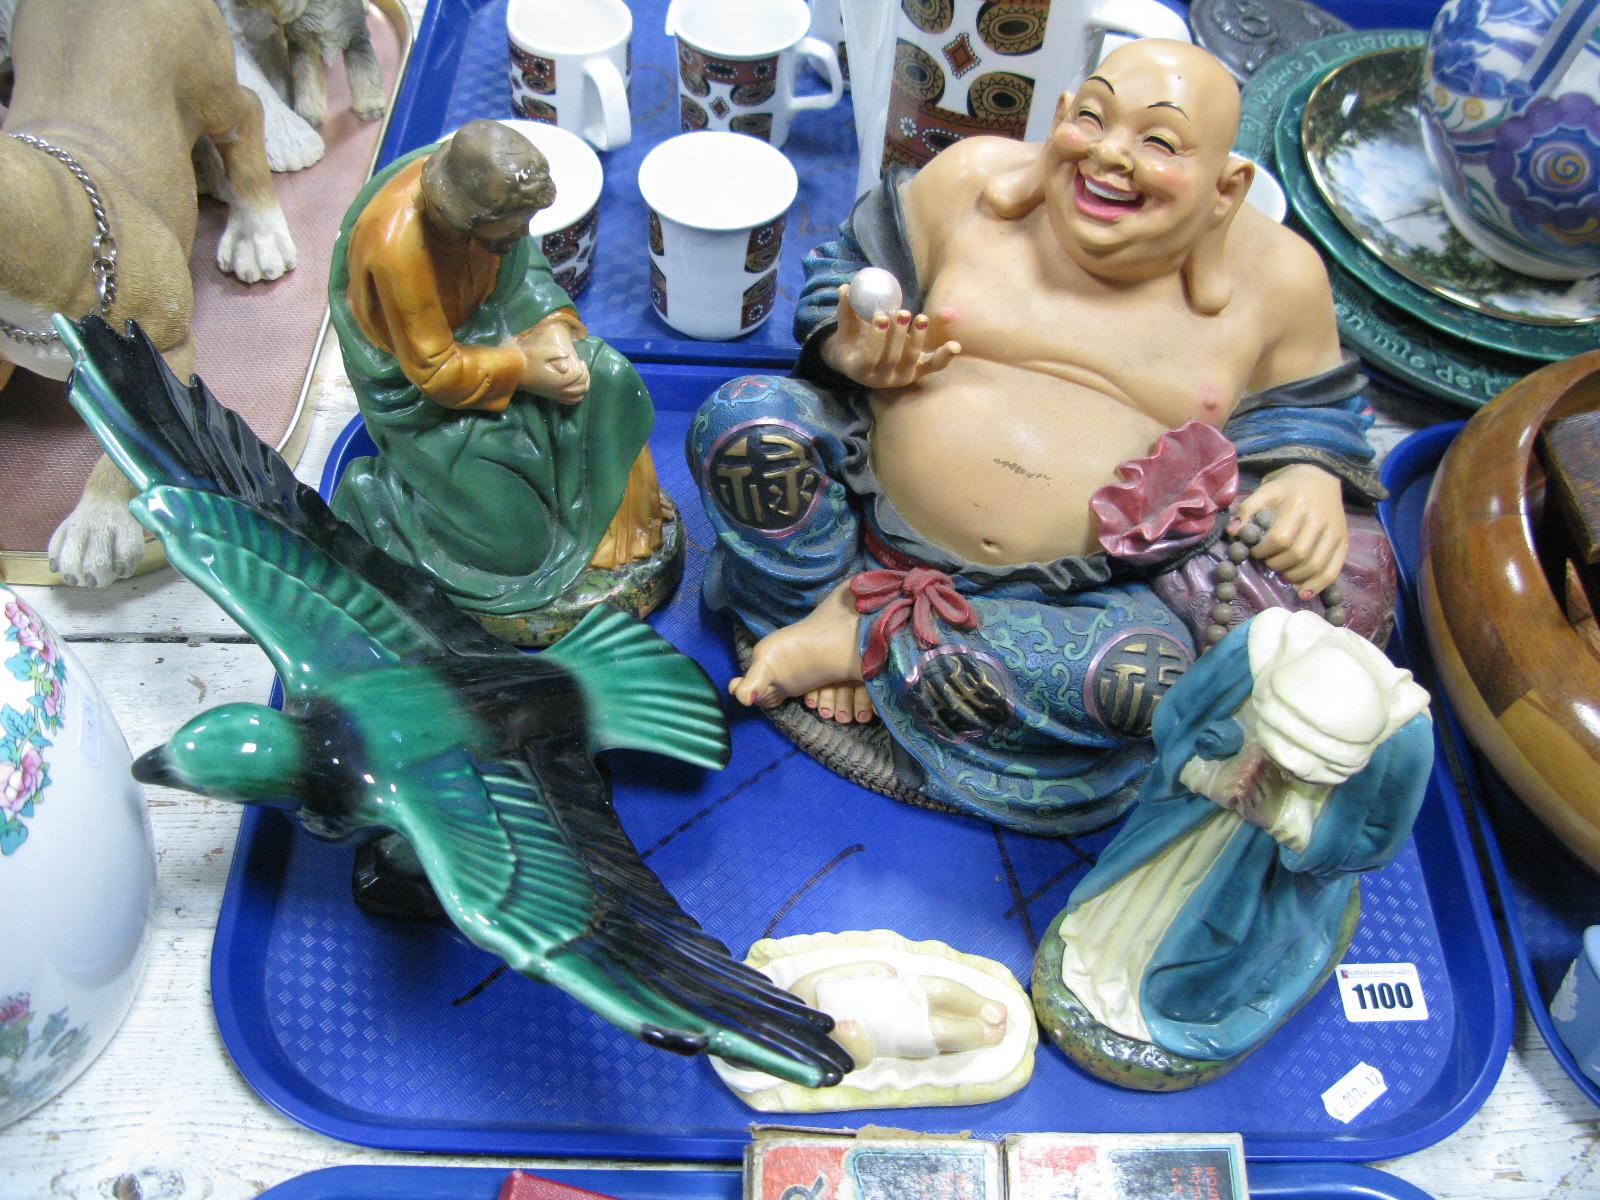 Lot 1100 - 1930's Plaster Religious Figures, resin Buddah, pottery bird: -One Tray